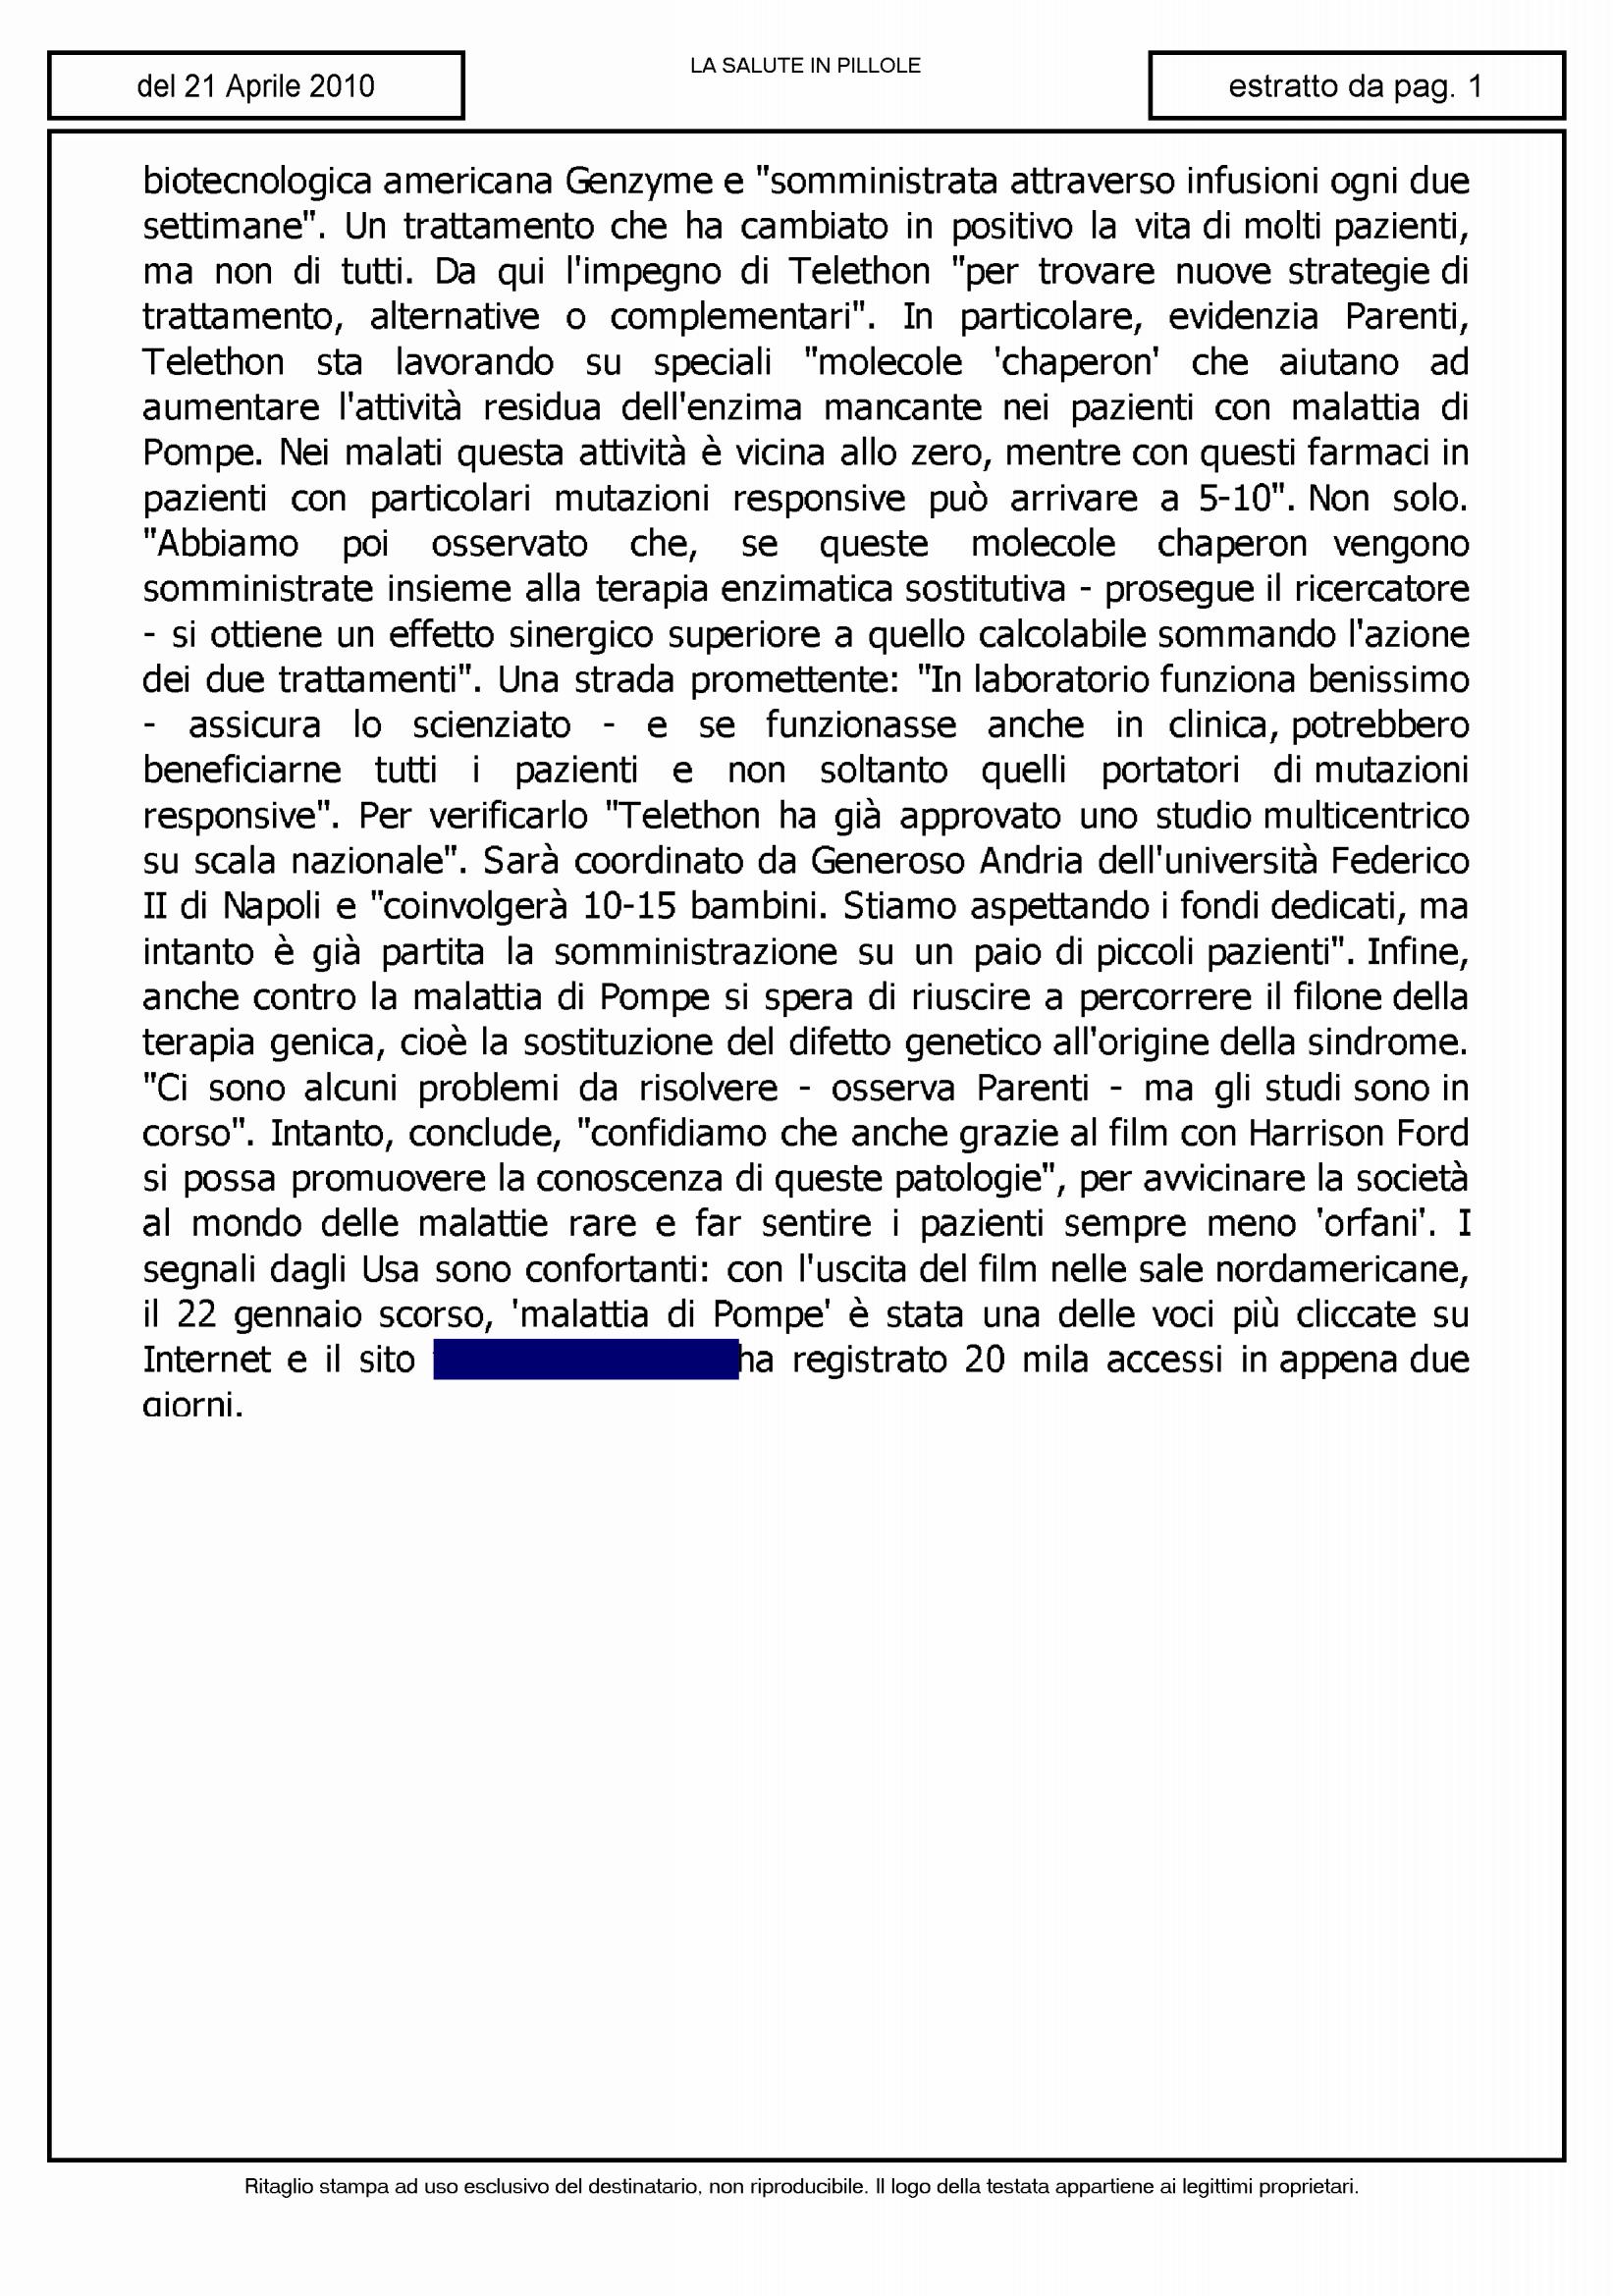 Stampa_20100422_misure straordinarie_Page_80